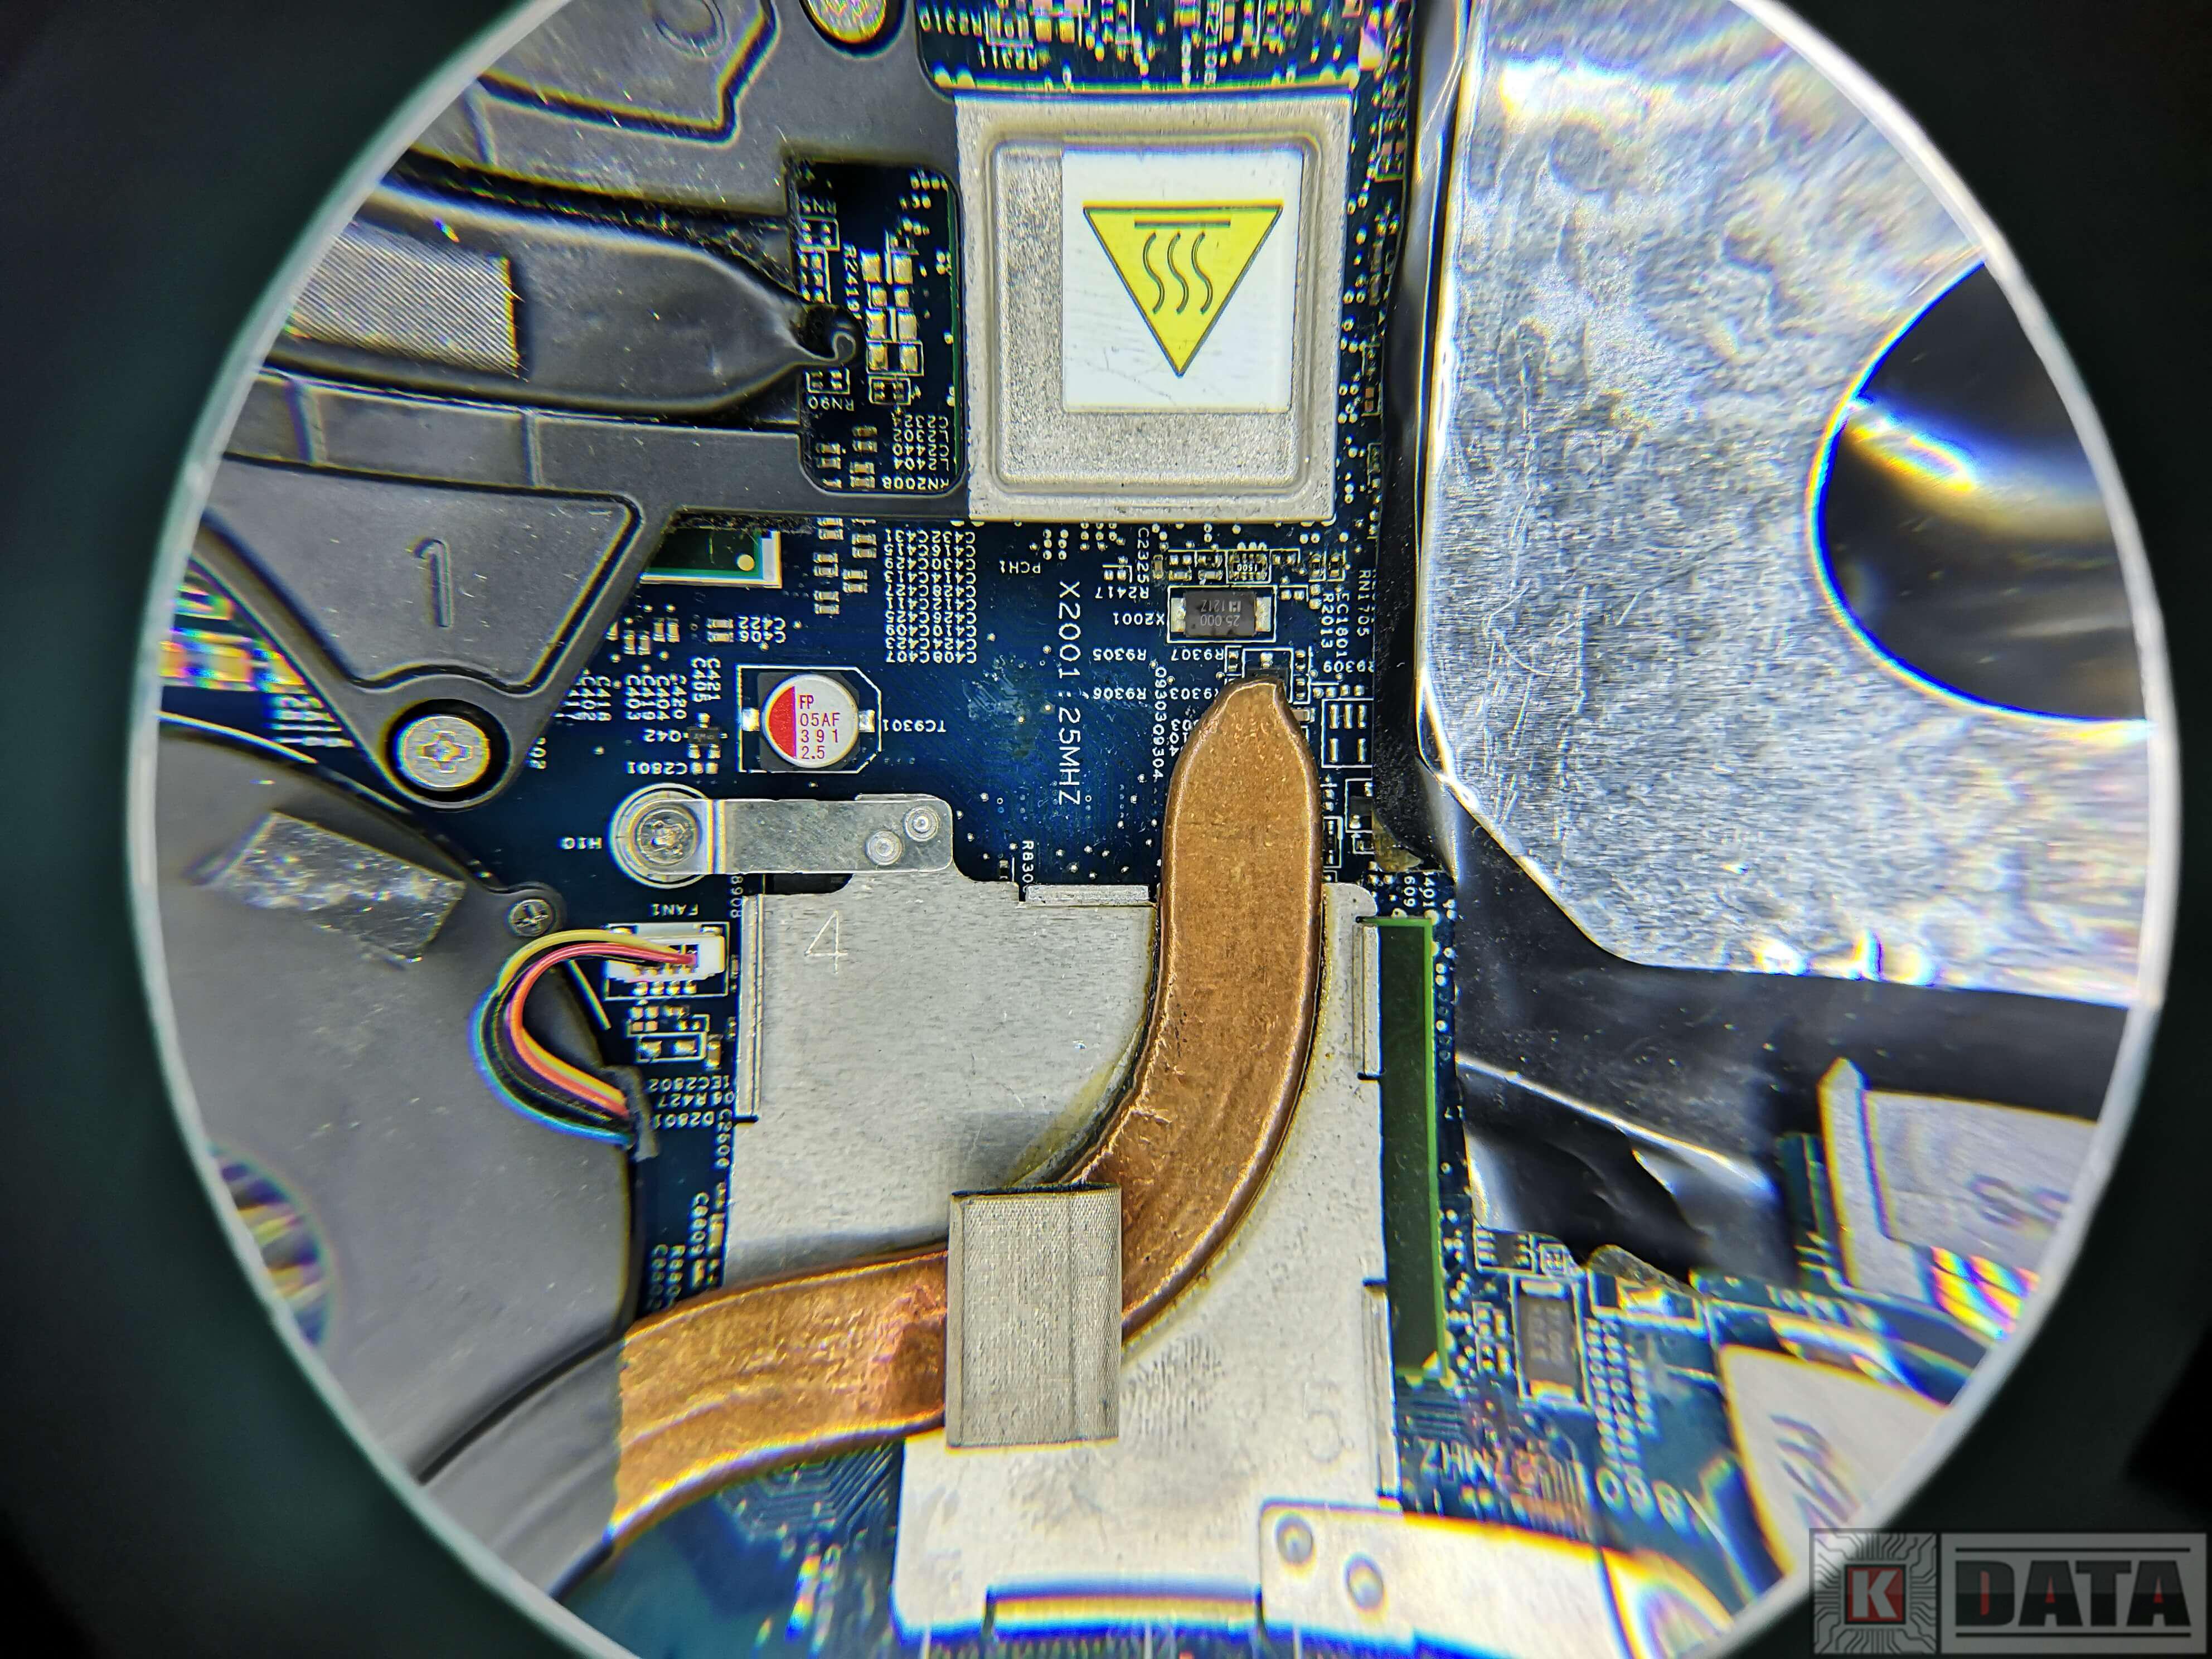 Lenovo IdeaPad Z570 pod lupą